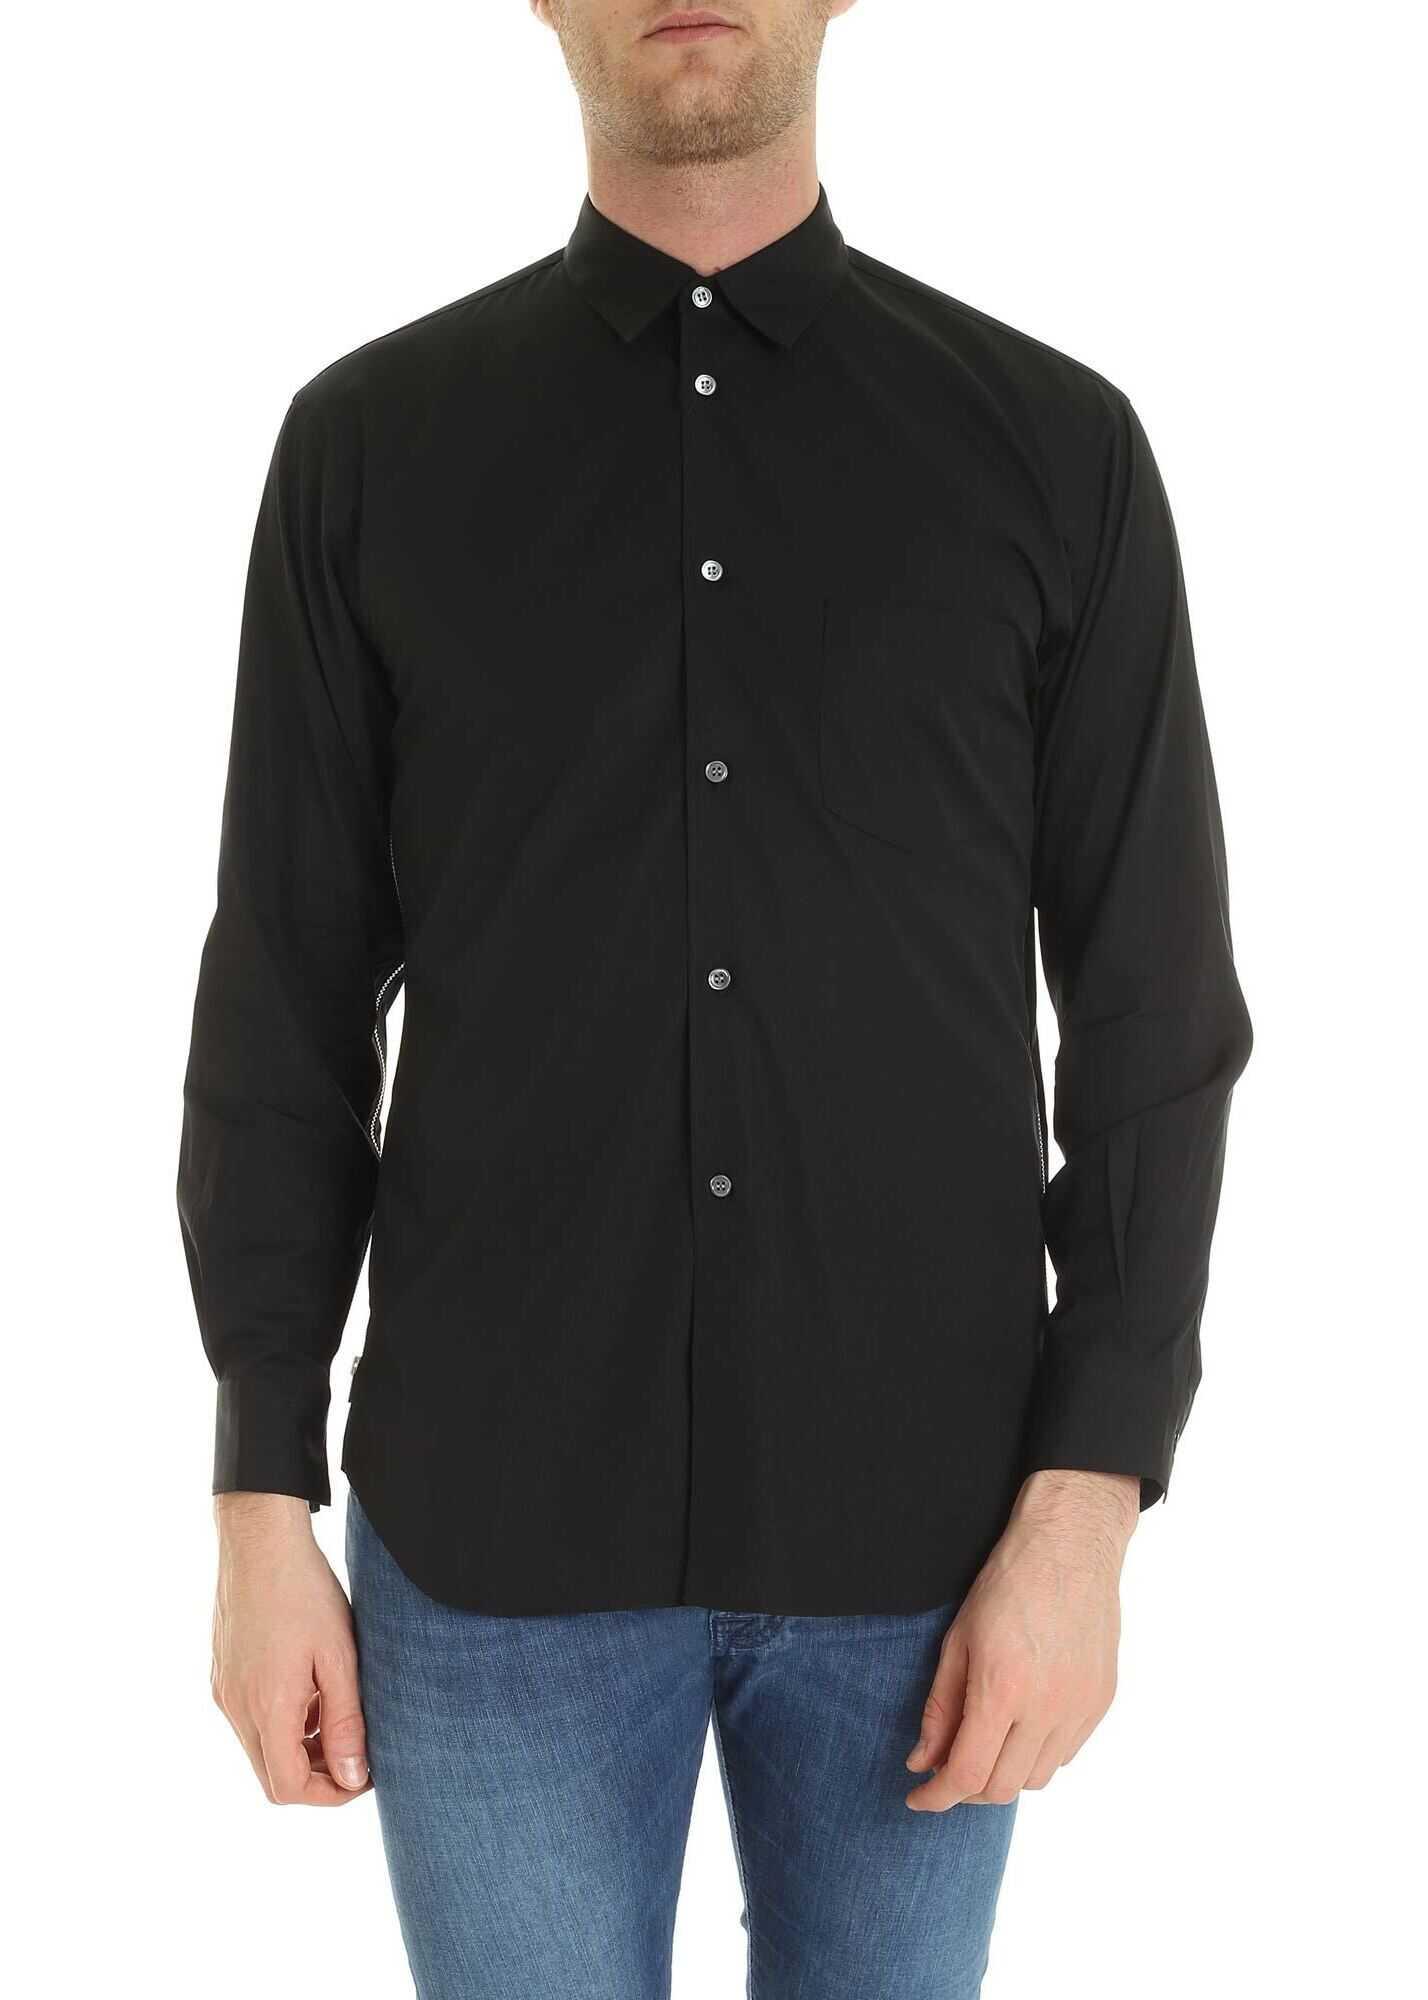 Side Zip Shirt In Black thumbnail